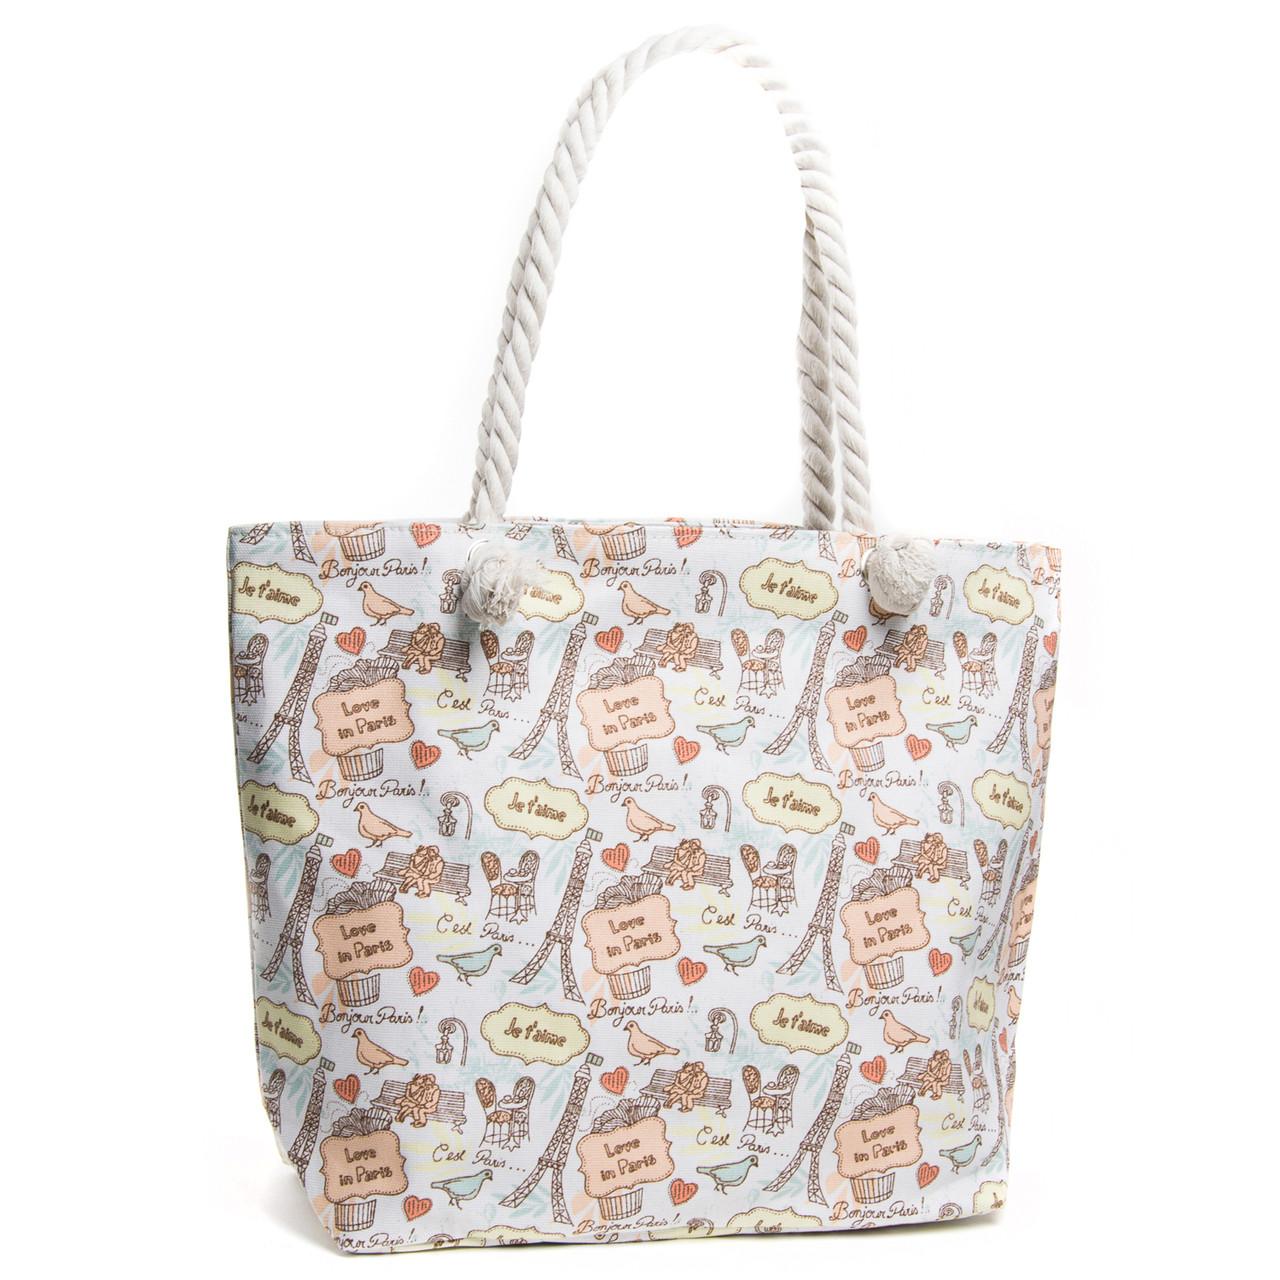 Пляжная сумка женская летняя тканевая ручки канаты с рисунком Париж Белая 5018-3